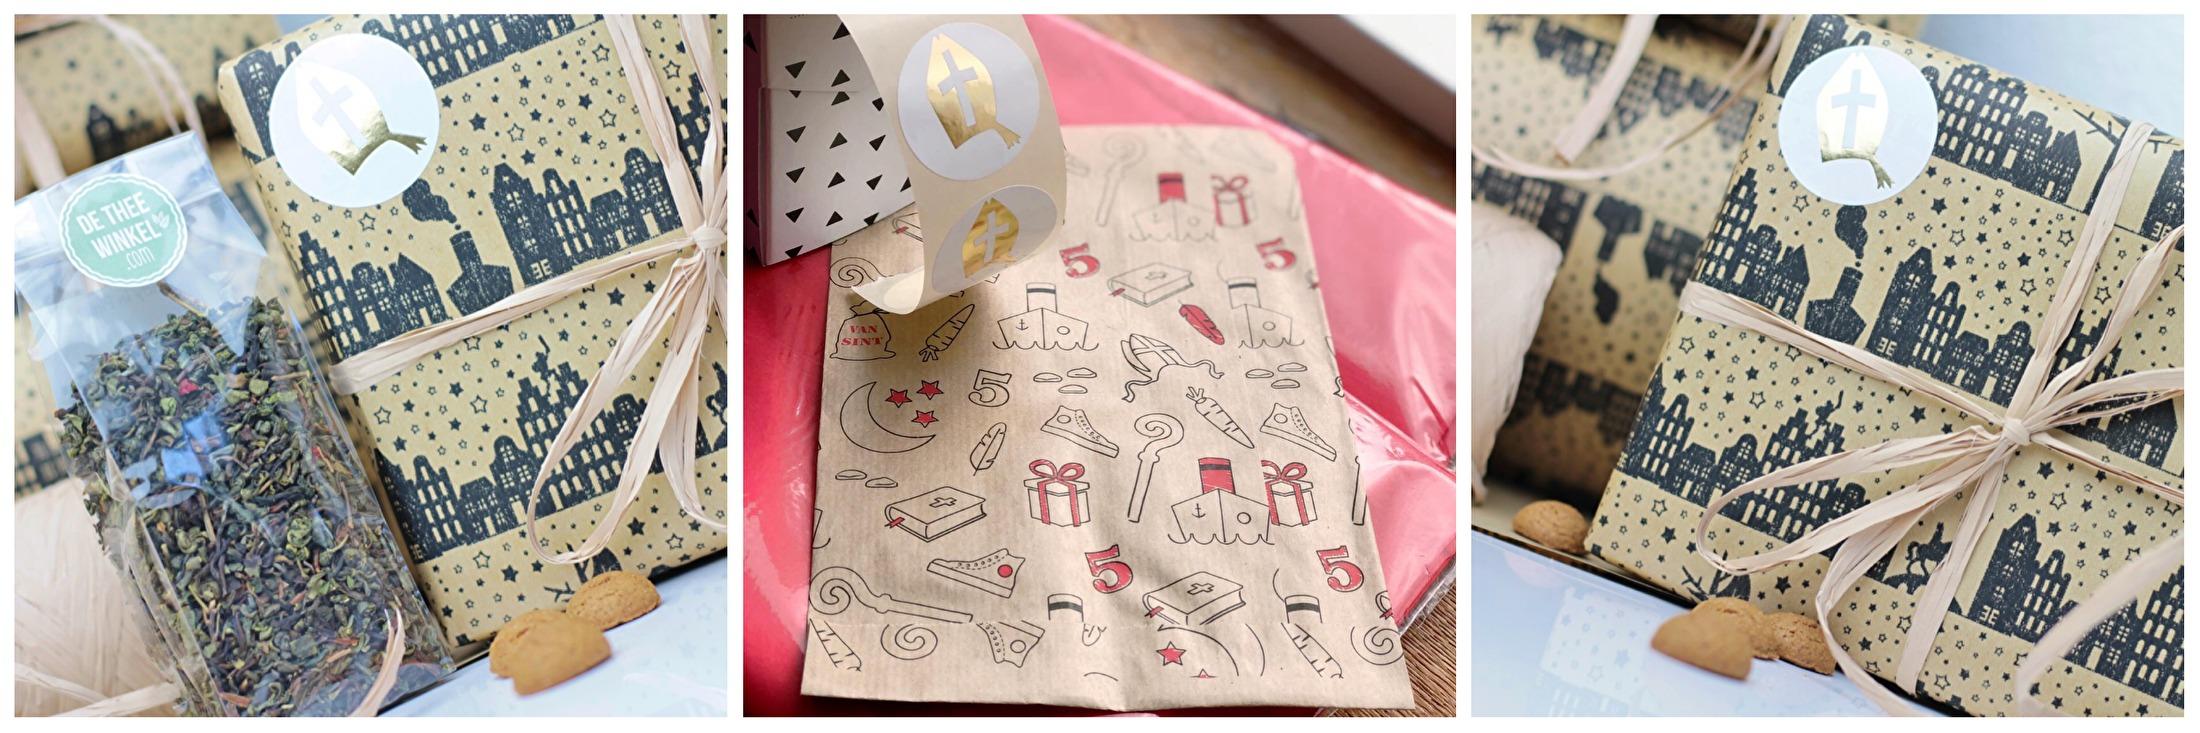 Sinterklaas Thee Cadeau De Thee Winkel Sinterklaas Thee